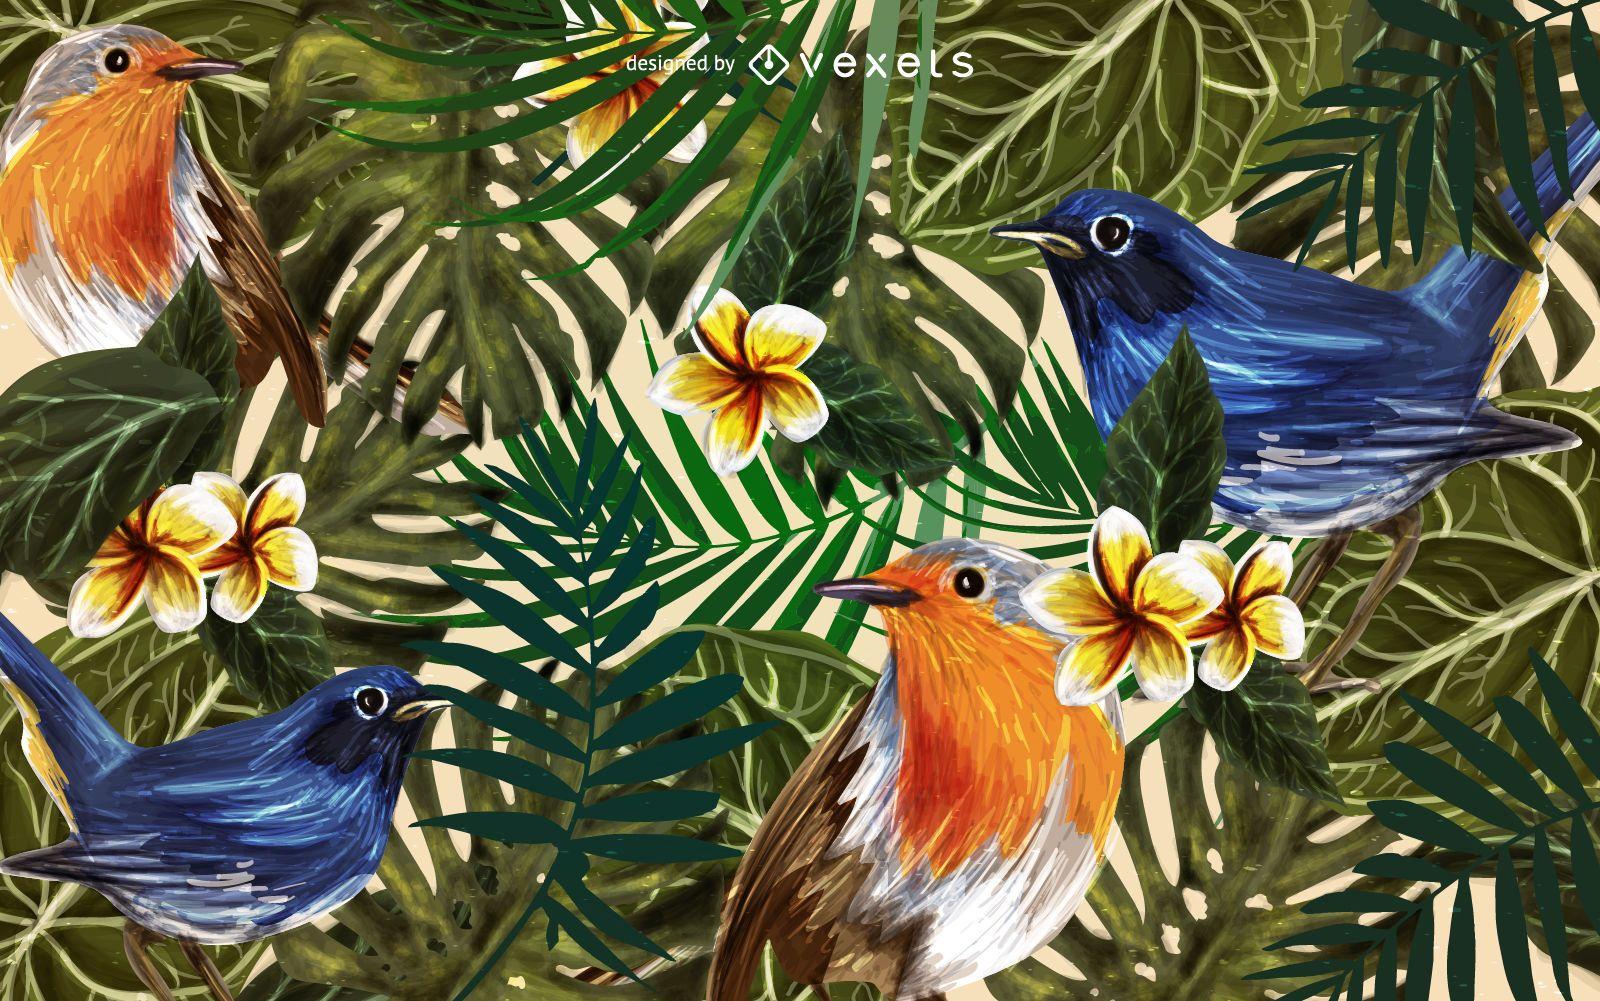 Fondo de aves tropicales pinz?n